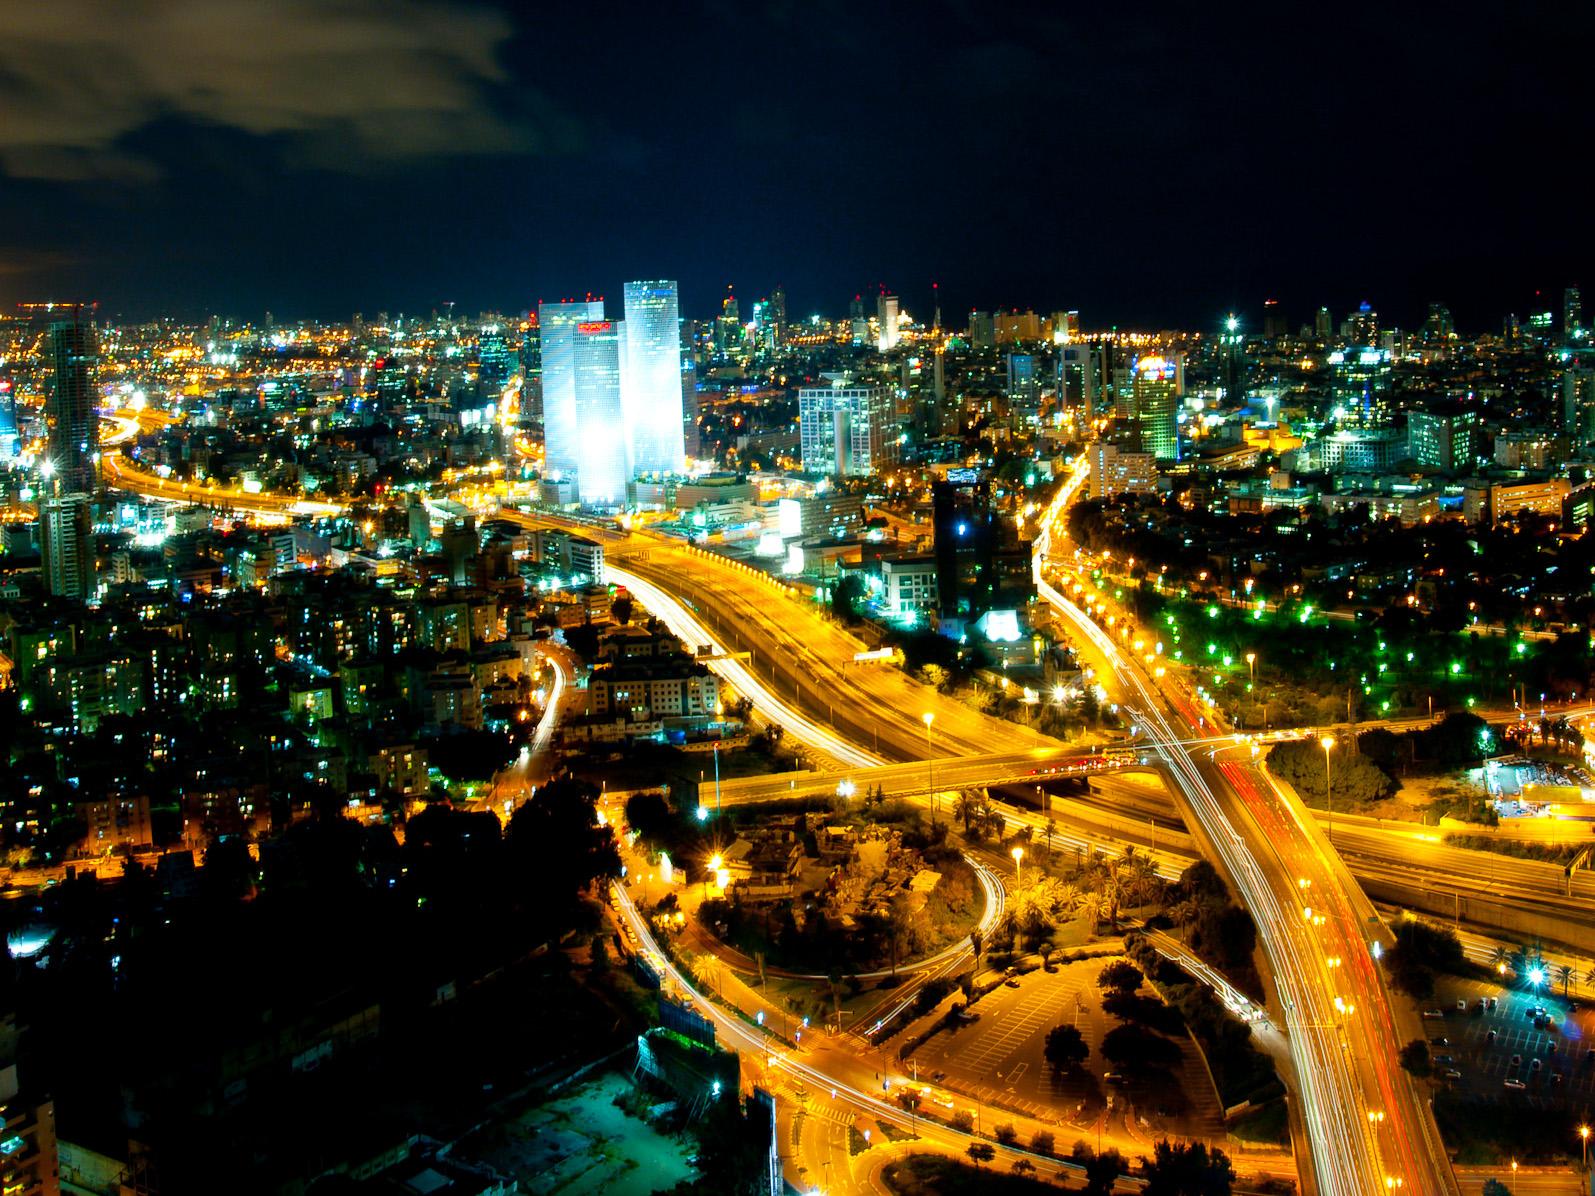 New Hotel Rooms built in Jerusalem